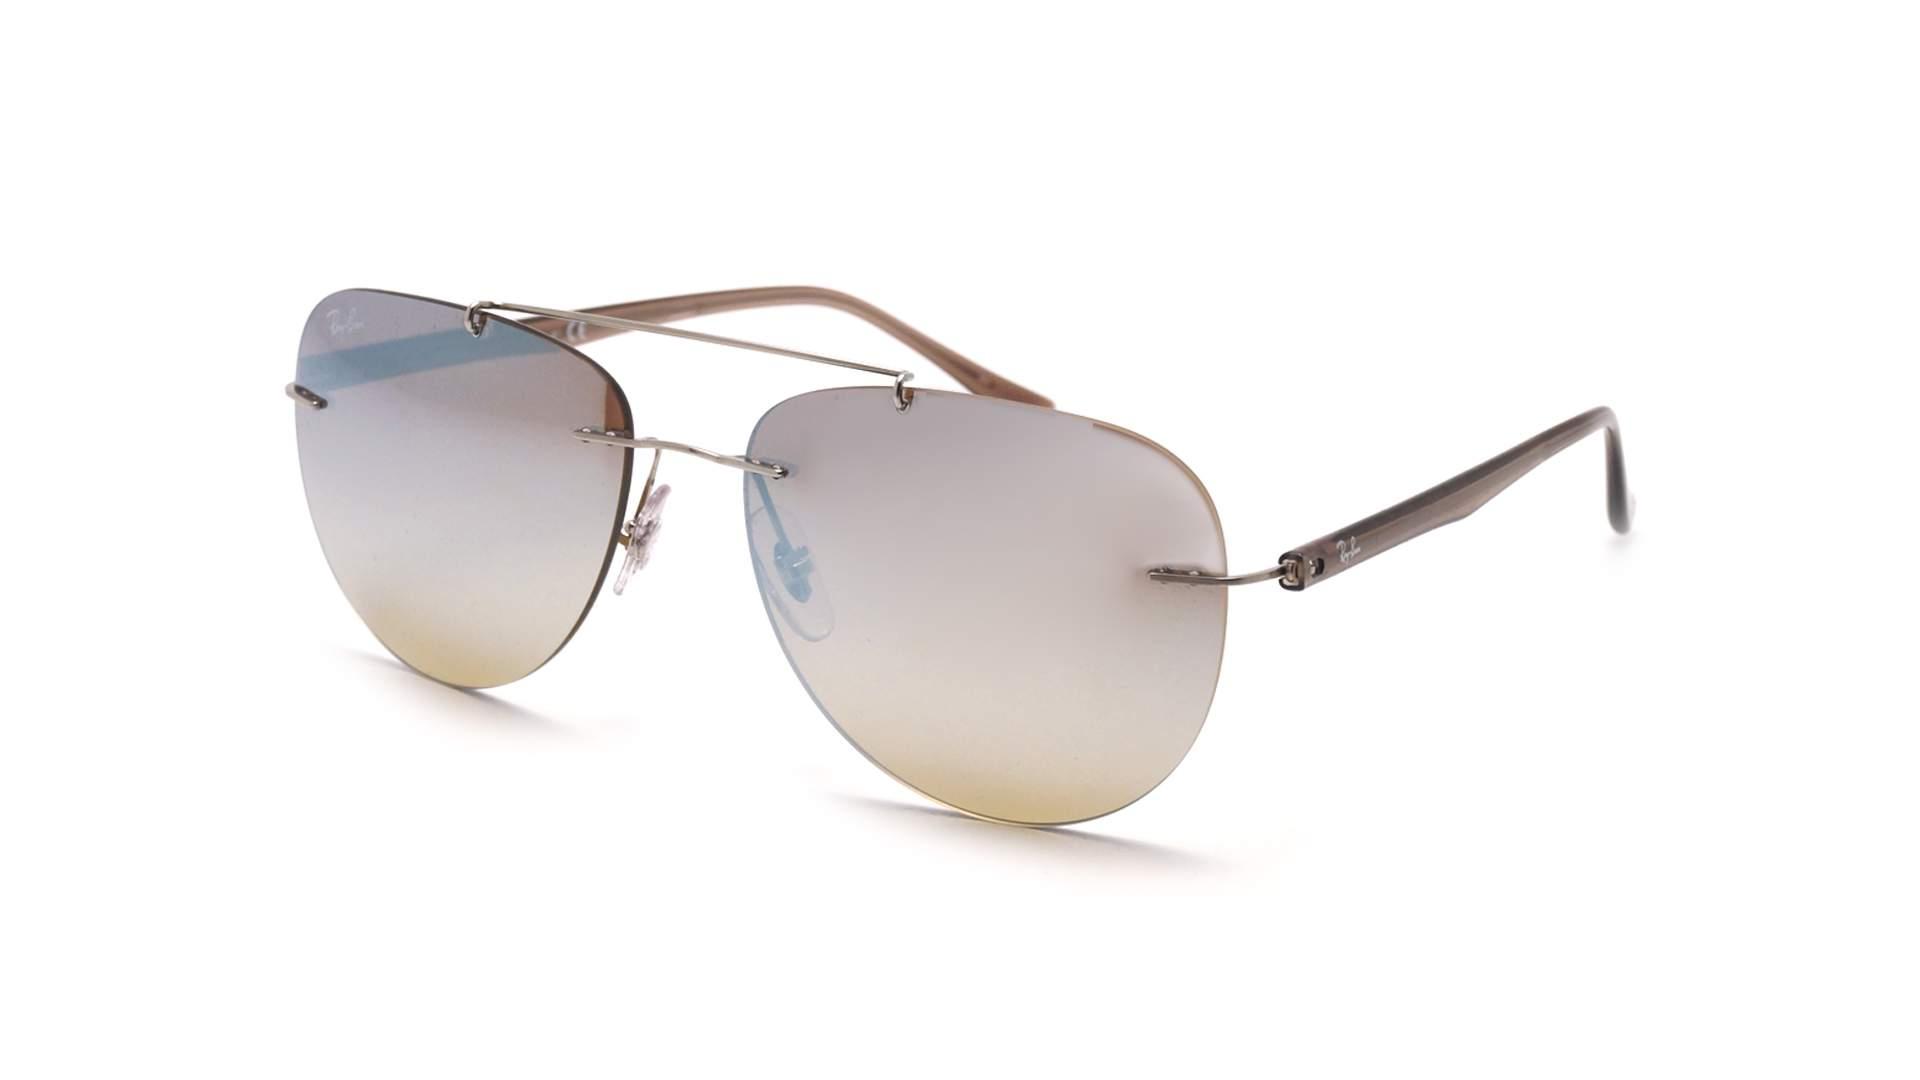 Sunglasses Ray-Ban Light ray Silver RB8059 003 B8 57-16 Medium Gradient  Mirror 8c2d0a929c39